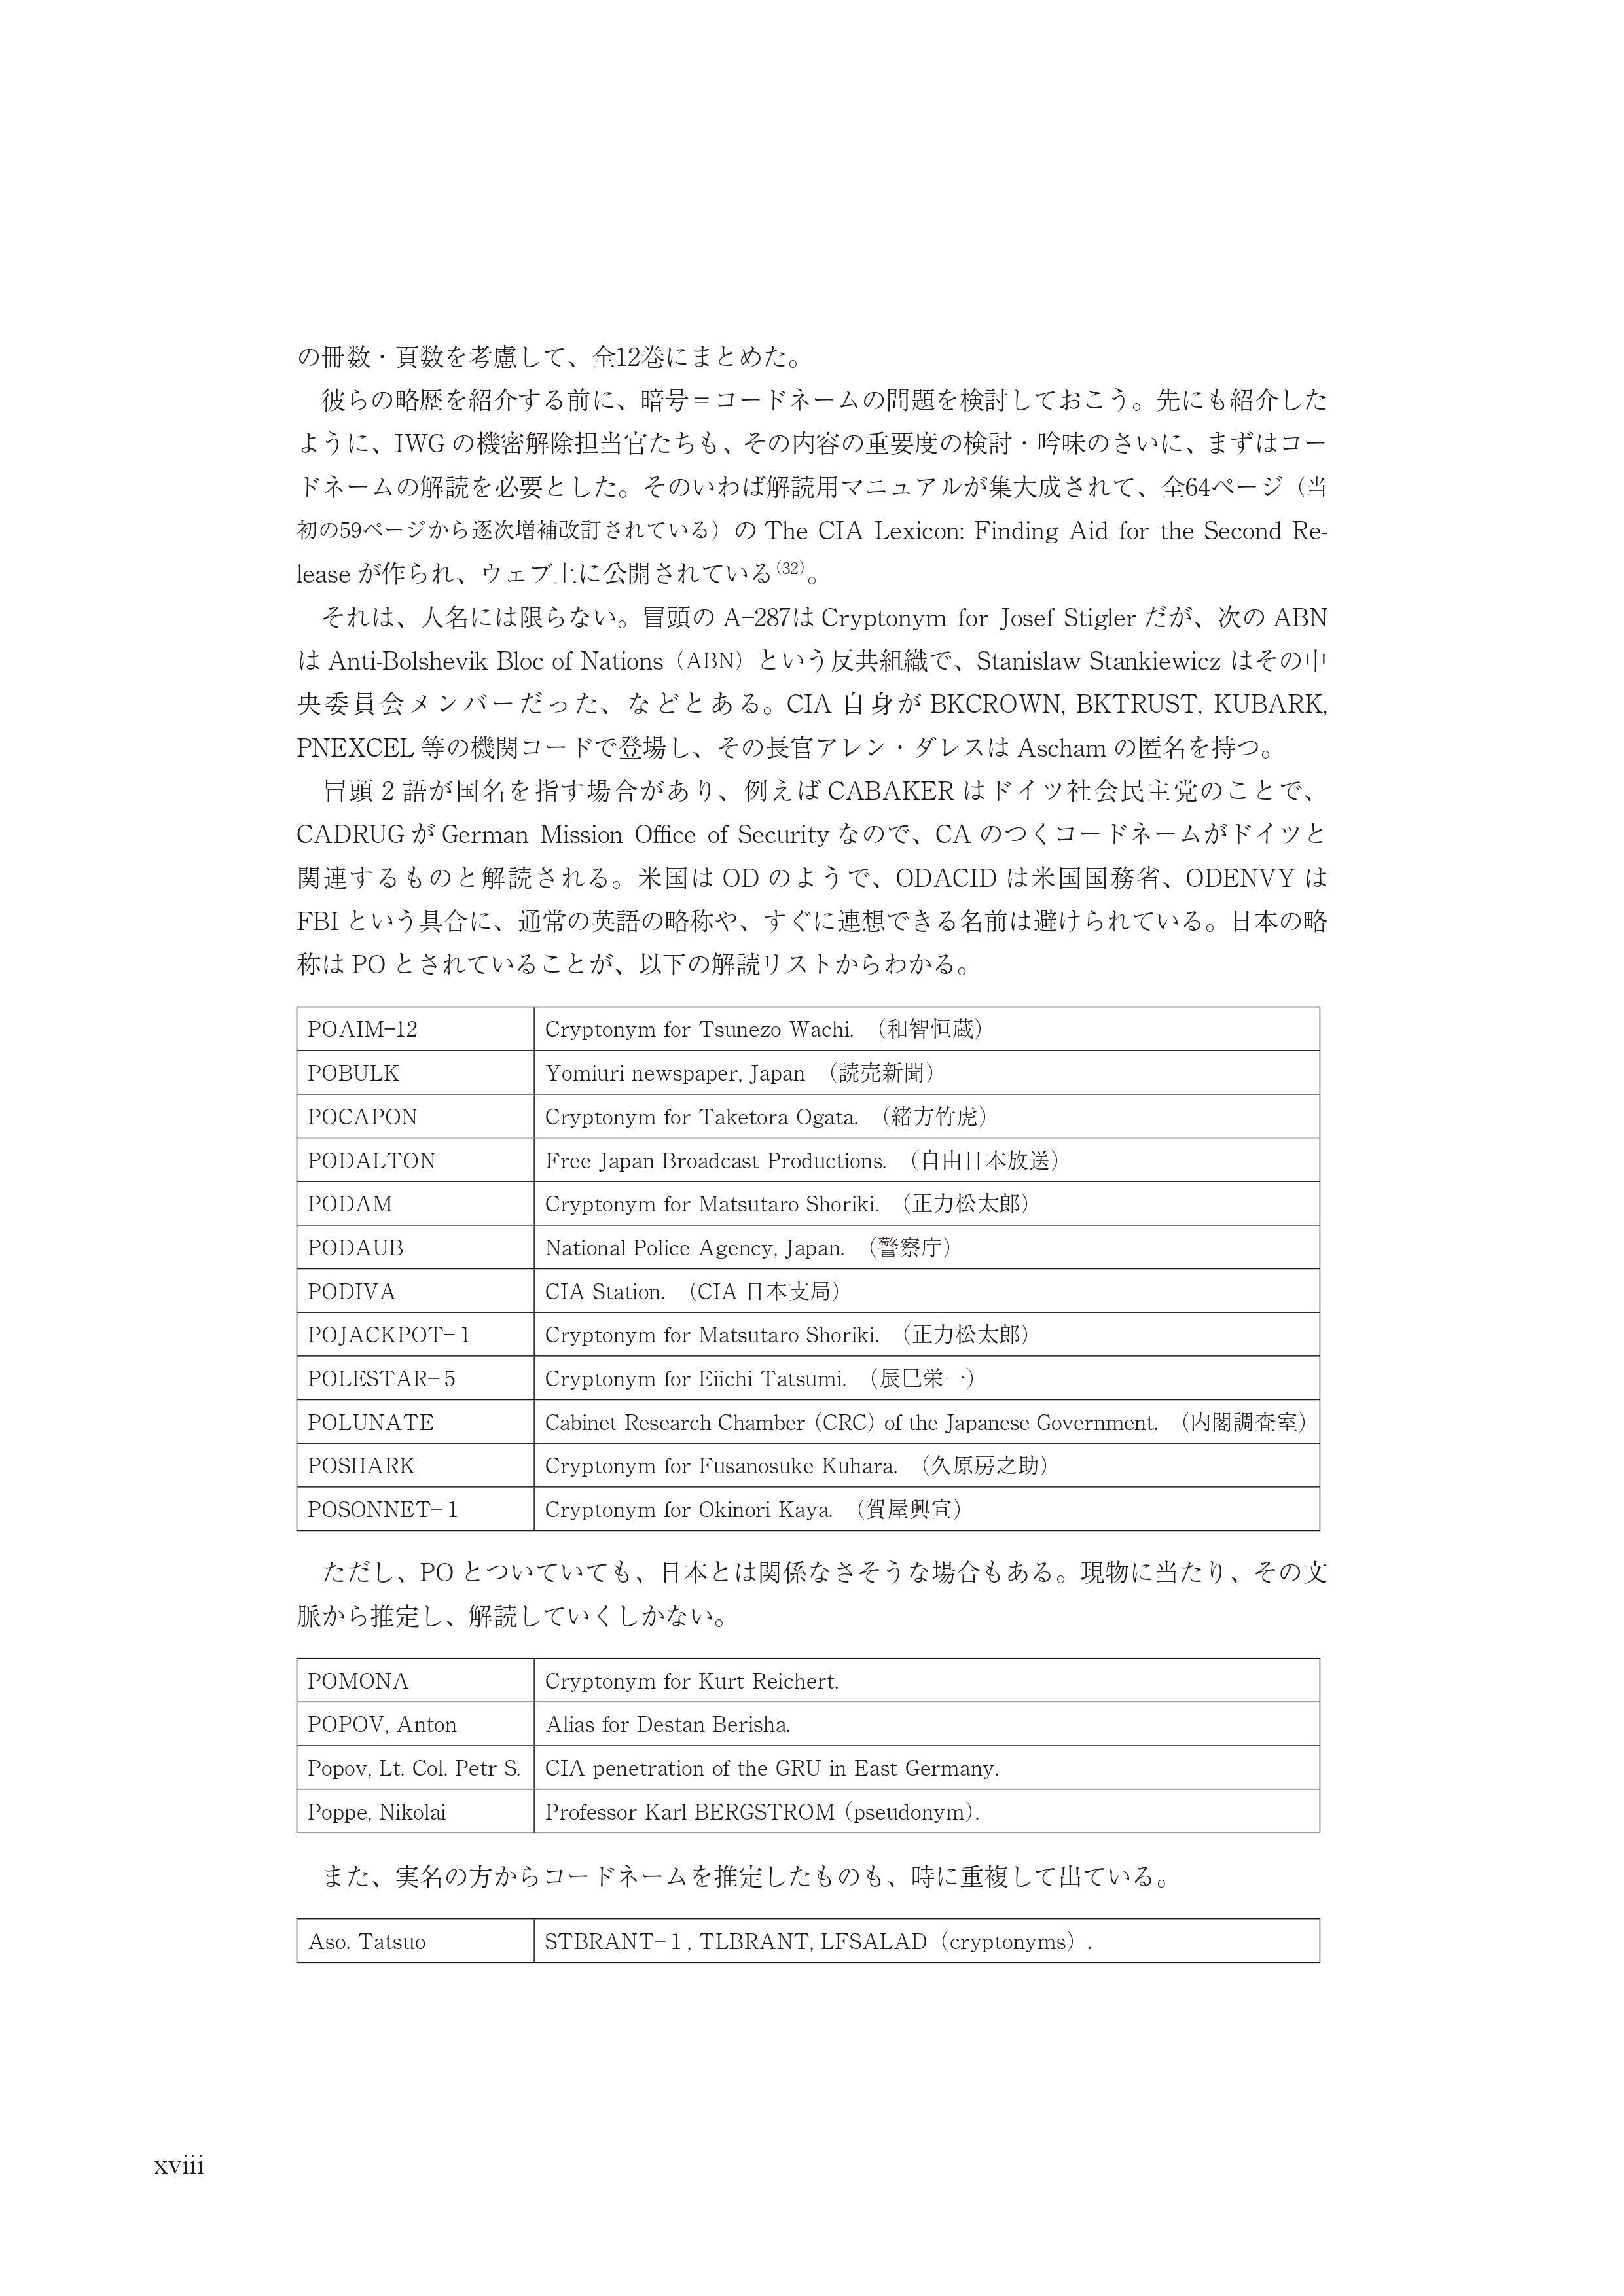 CIA日本人ファイル0001 (18)